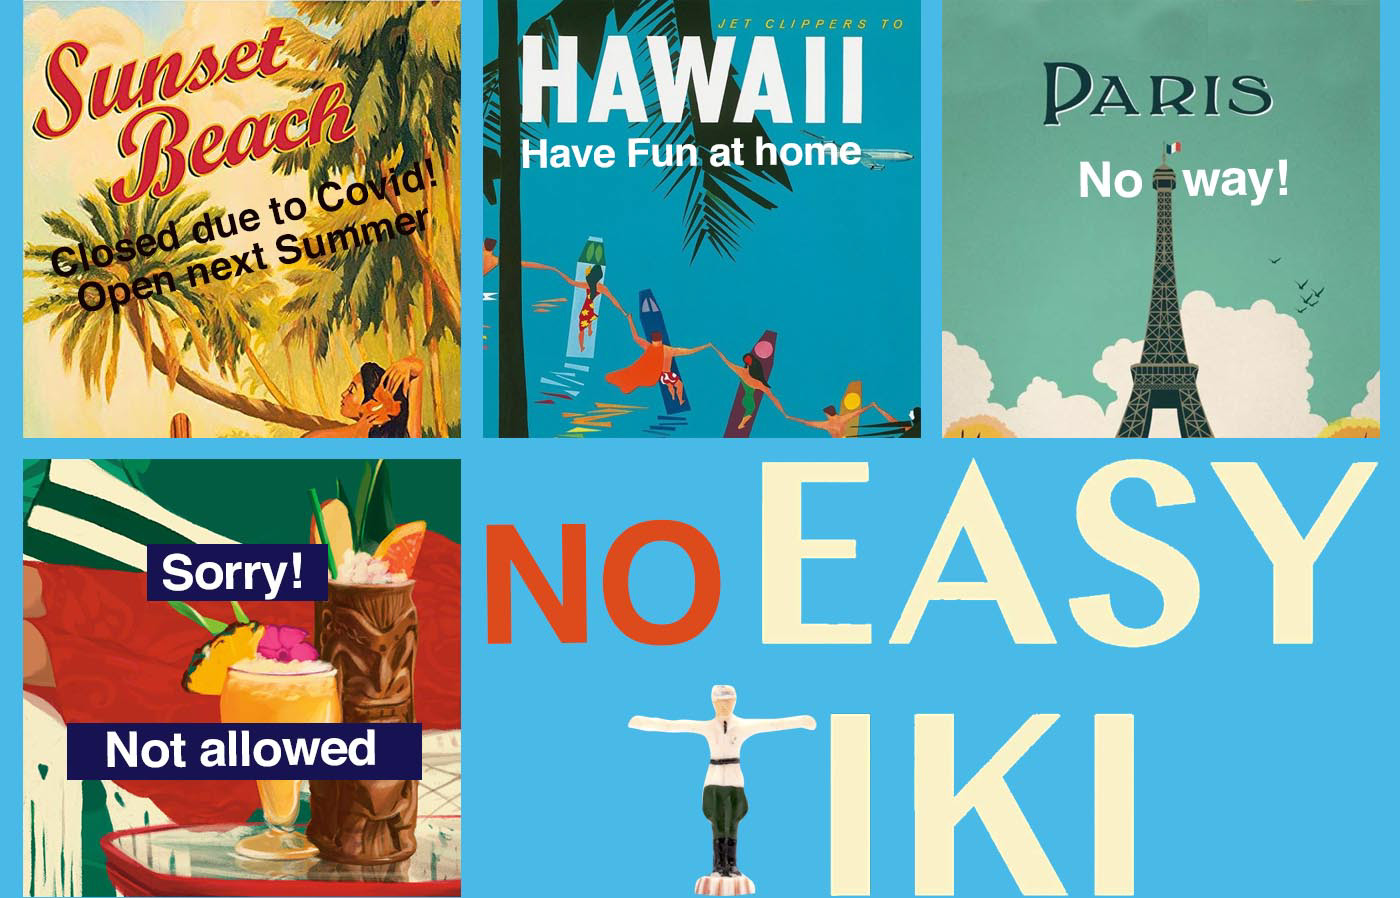 colagem collage corona COVID-19 editorial illutration future HAWAII tourism tourist Travel